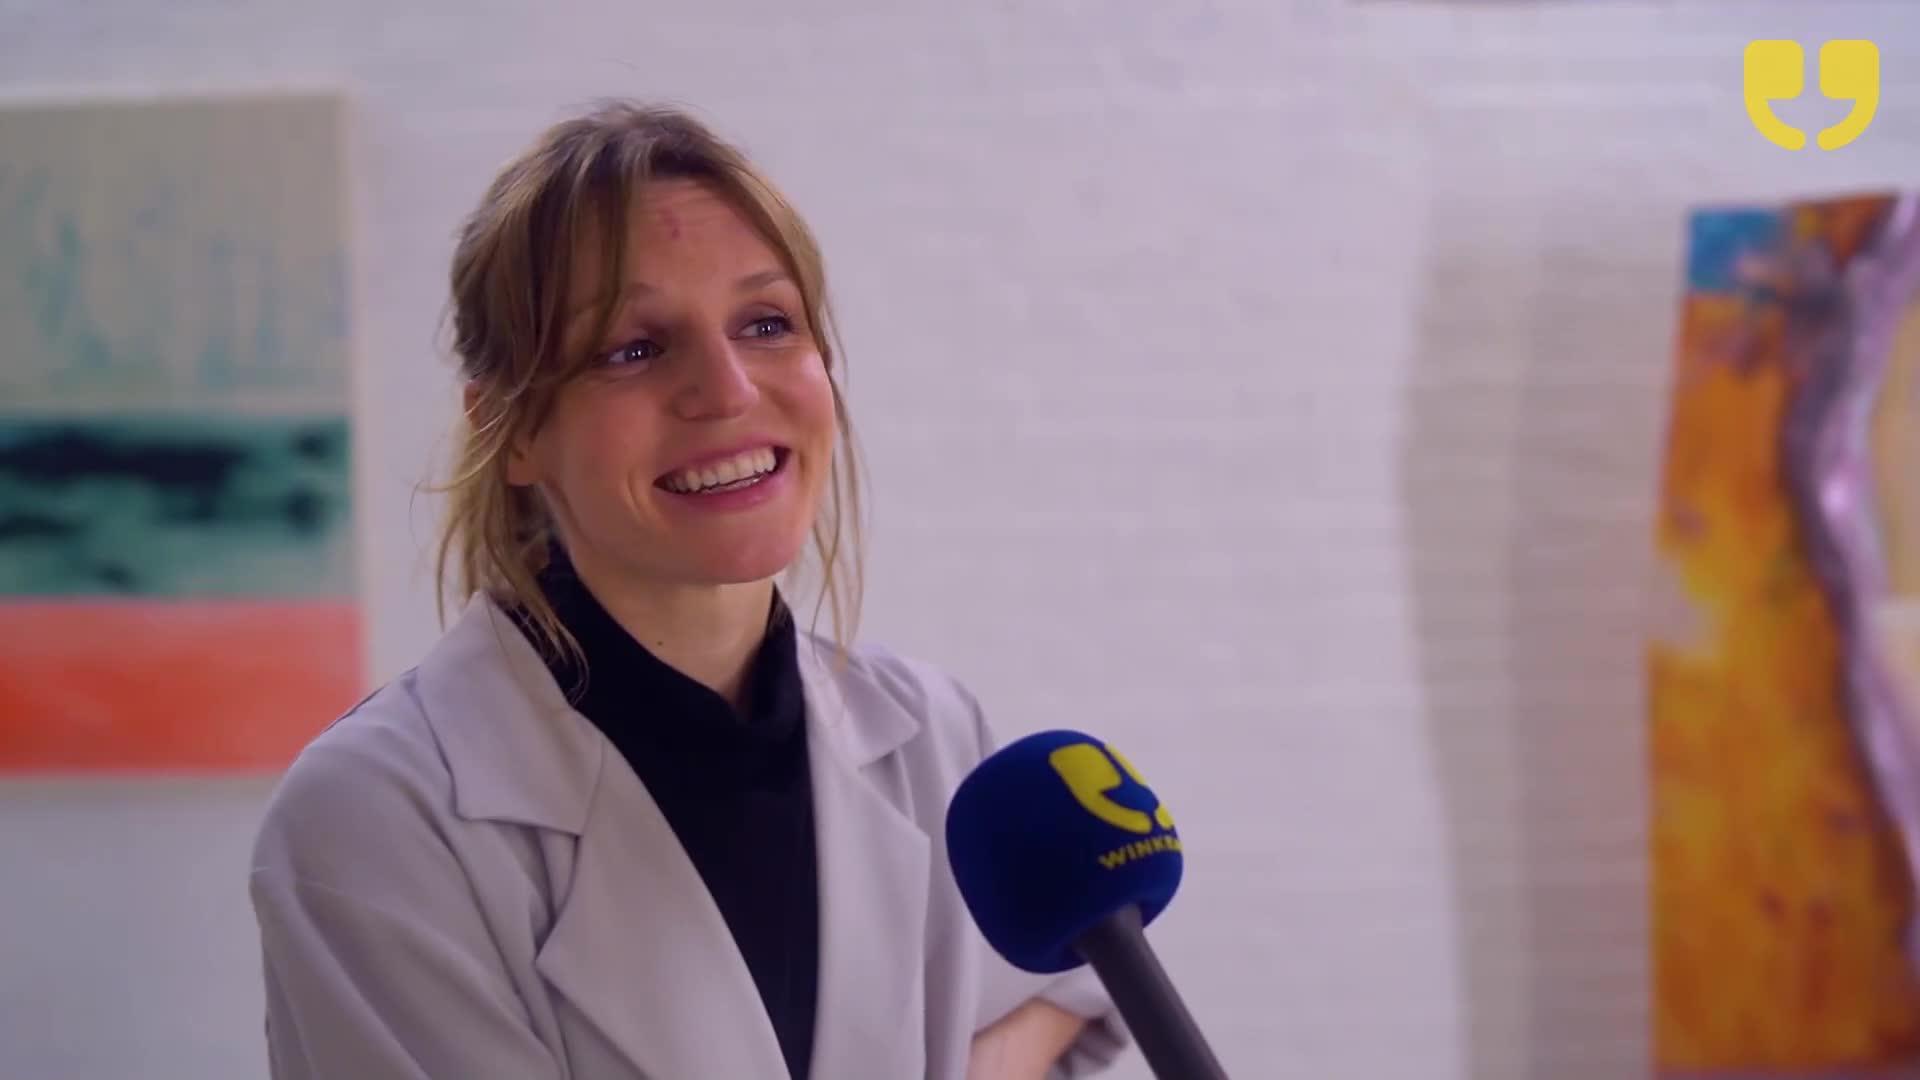 Carla Benzing